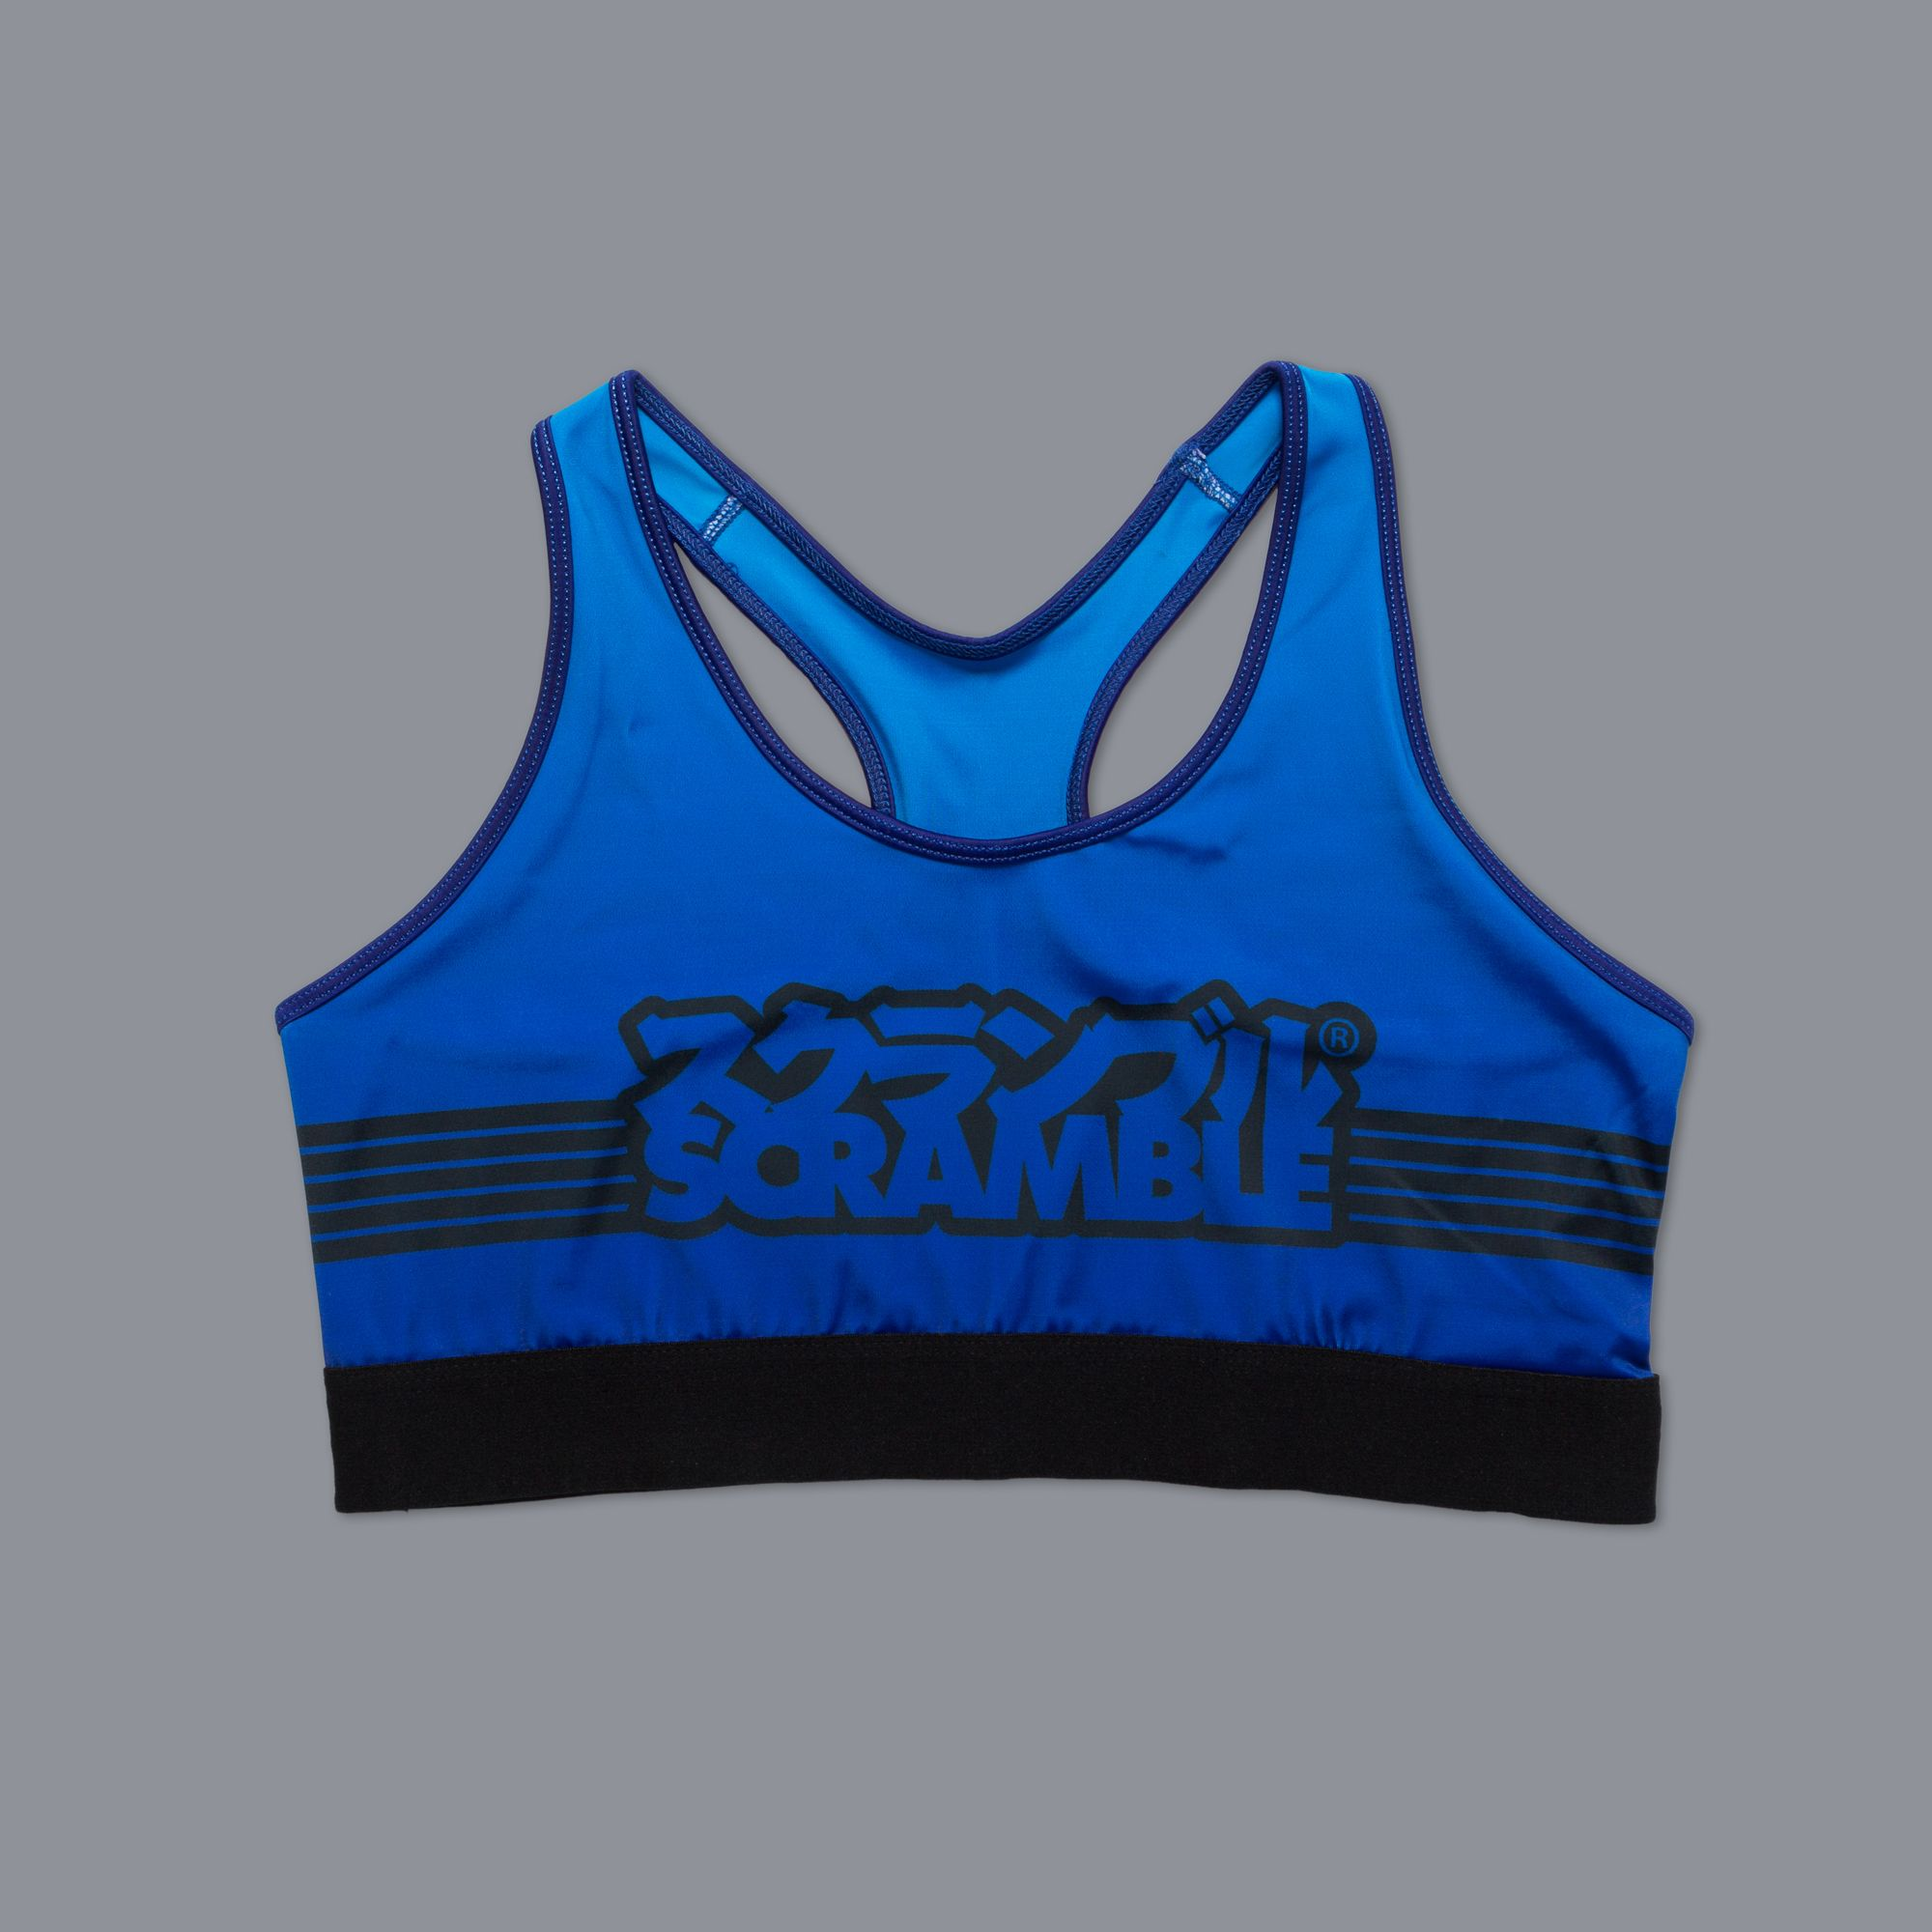 scramble-ladies-sports-bra